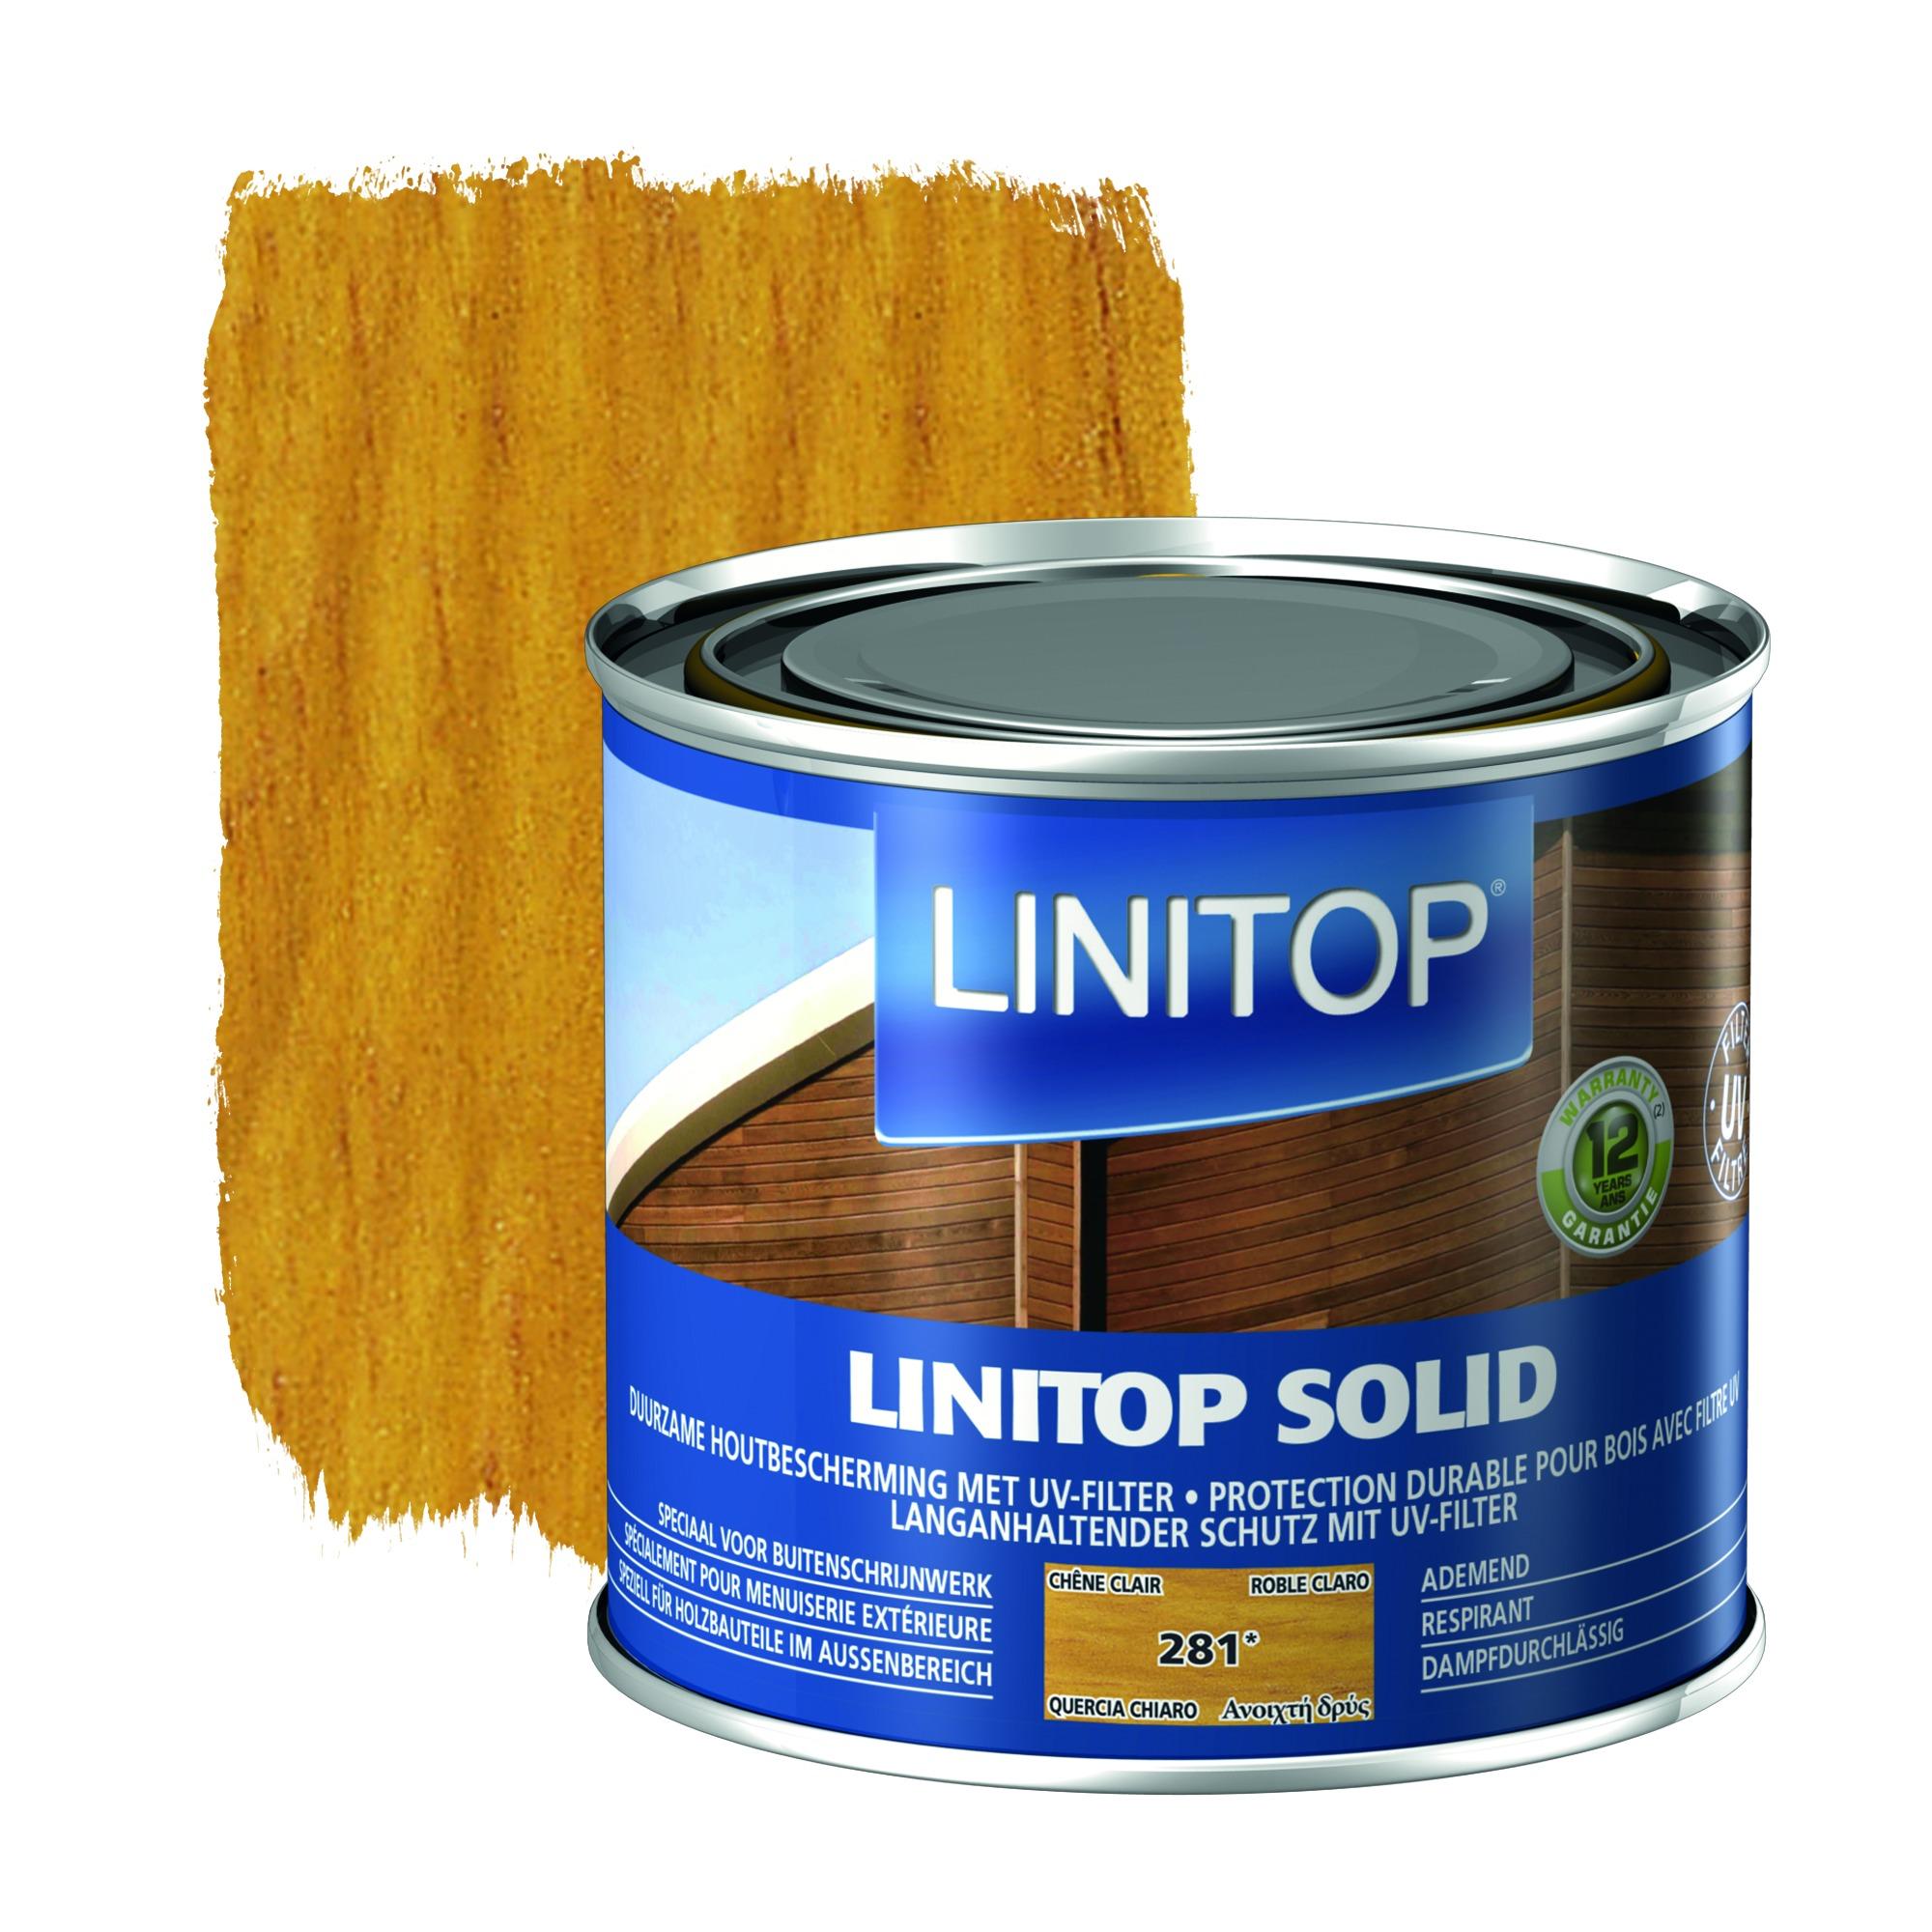 lasure linitop solid satin ch ne clair 500 ml vernis huiles lasures papier peint. Black Bedroom Furniture Sets. Home Design Ideas